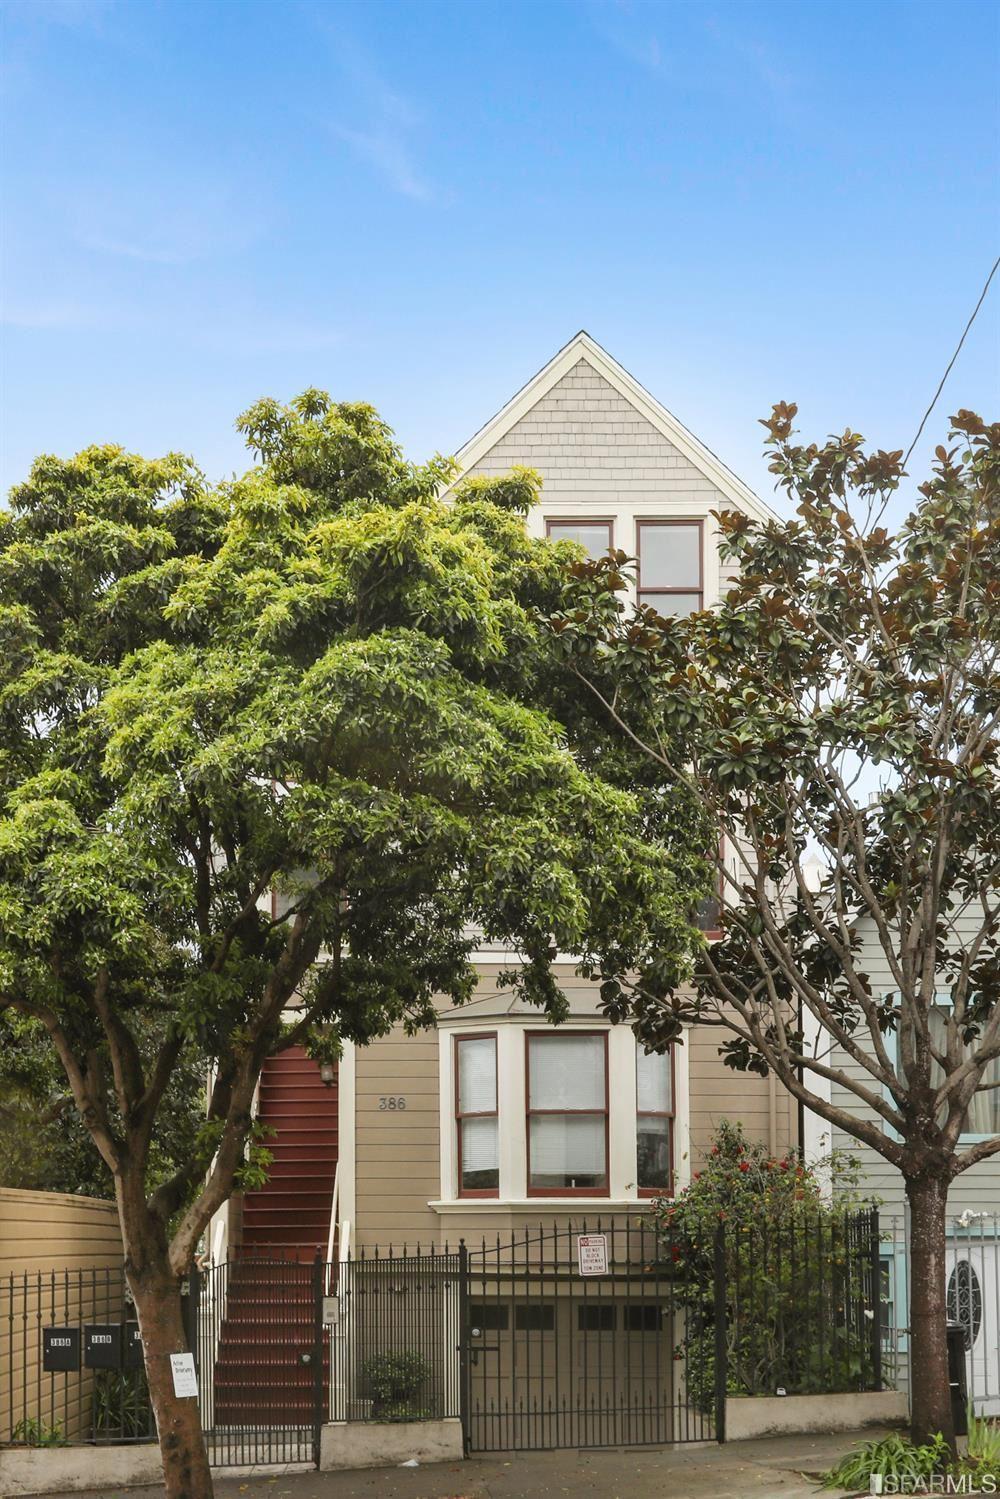 386 Richland Avenue #C, San Francisco, CA 94110 - #: 421526431